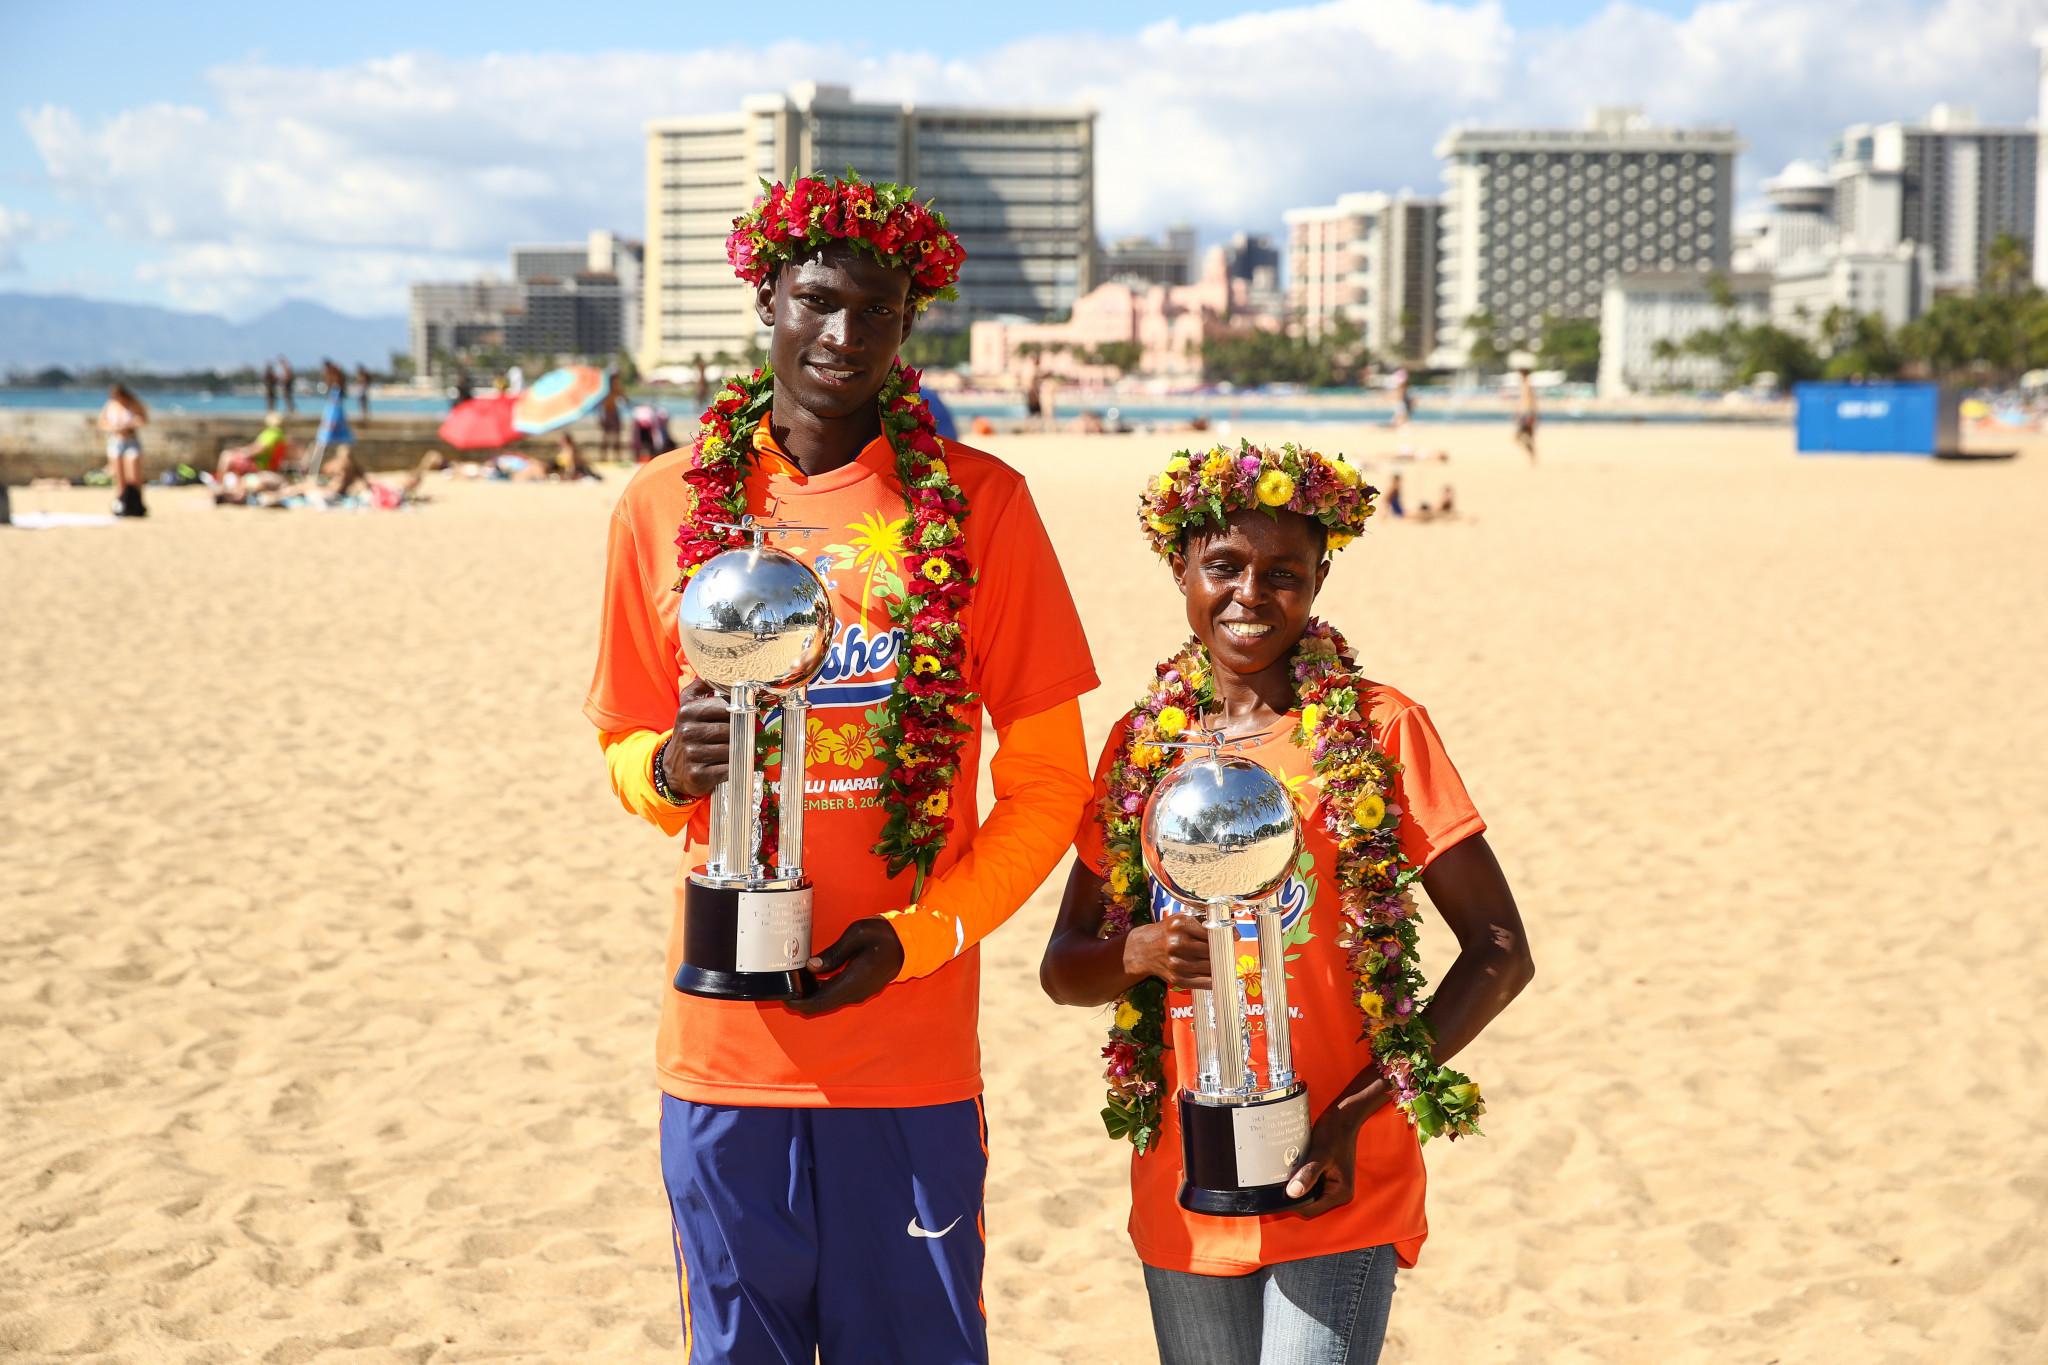 Titus Ekiru and Margaret Muriuki won the men's and women's races last year ©Getty Images